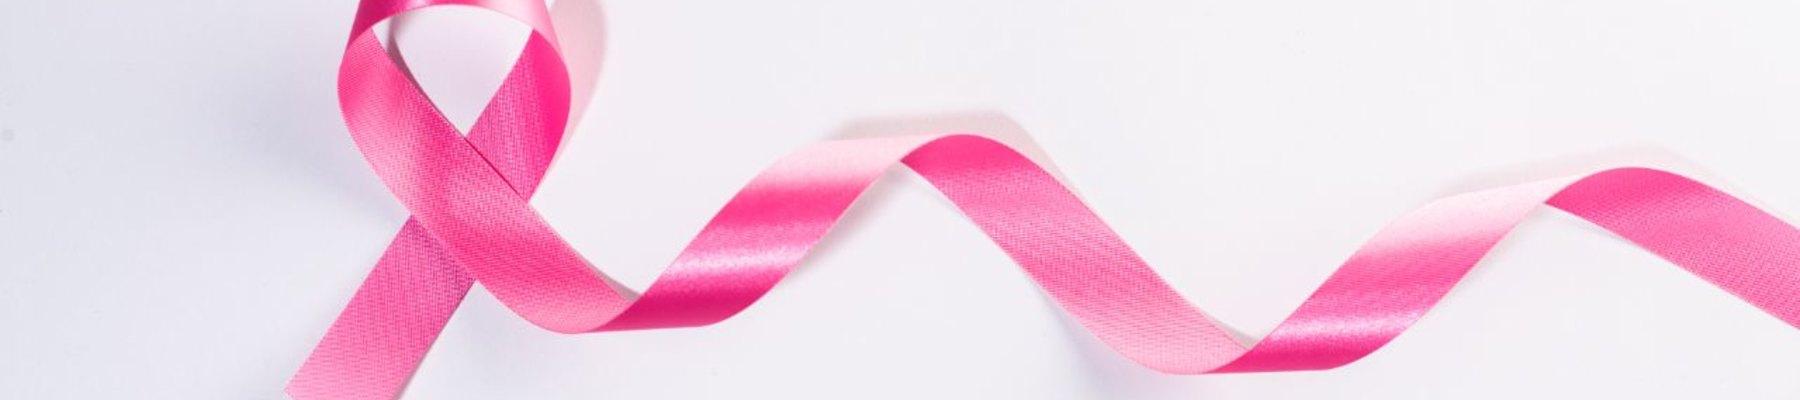 Mammapolikliniek (borstkanker)